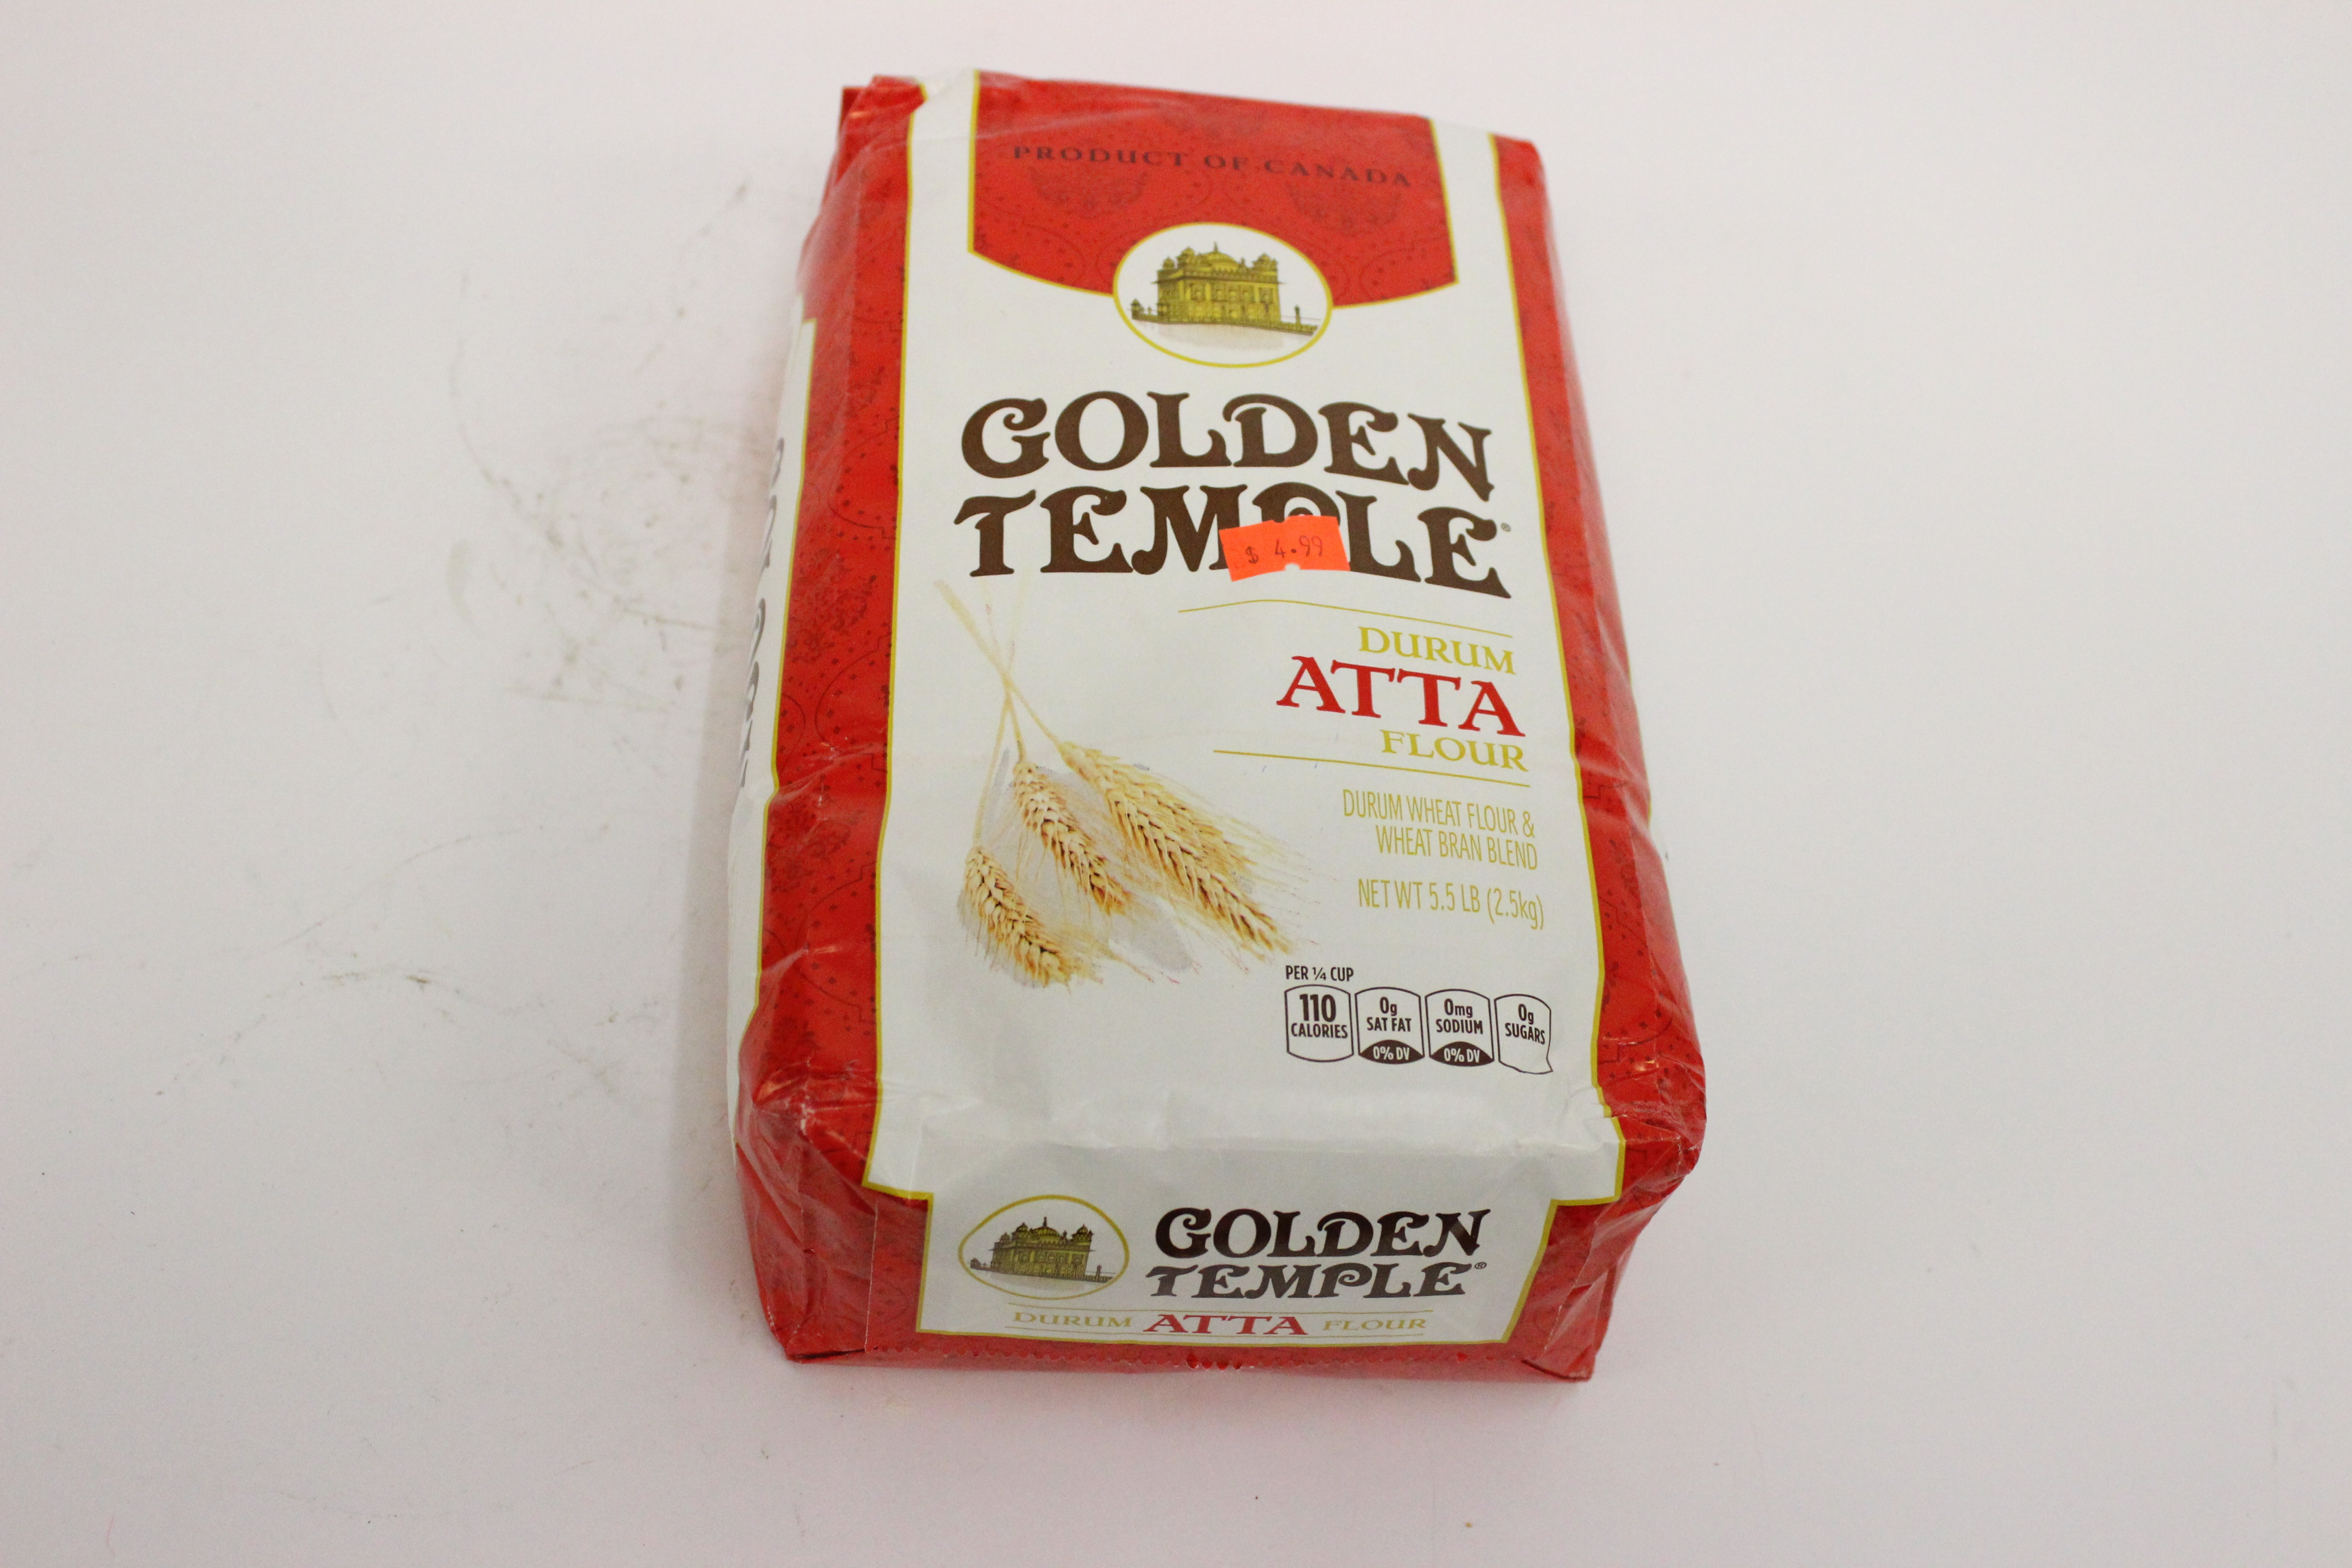 Golden Temple Atta 5.50 lbs